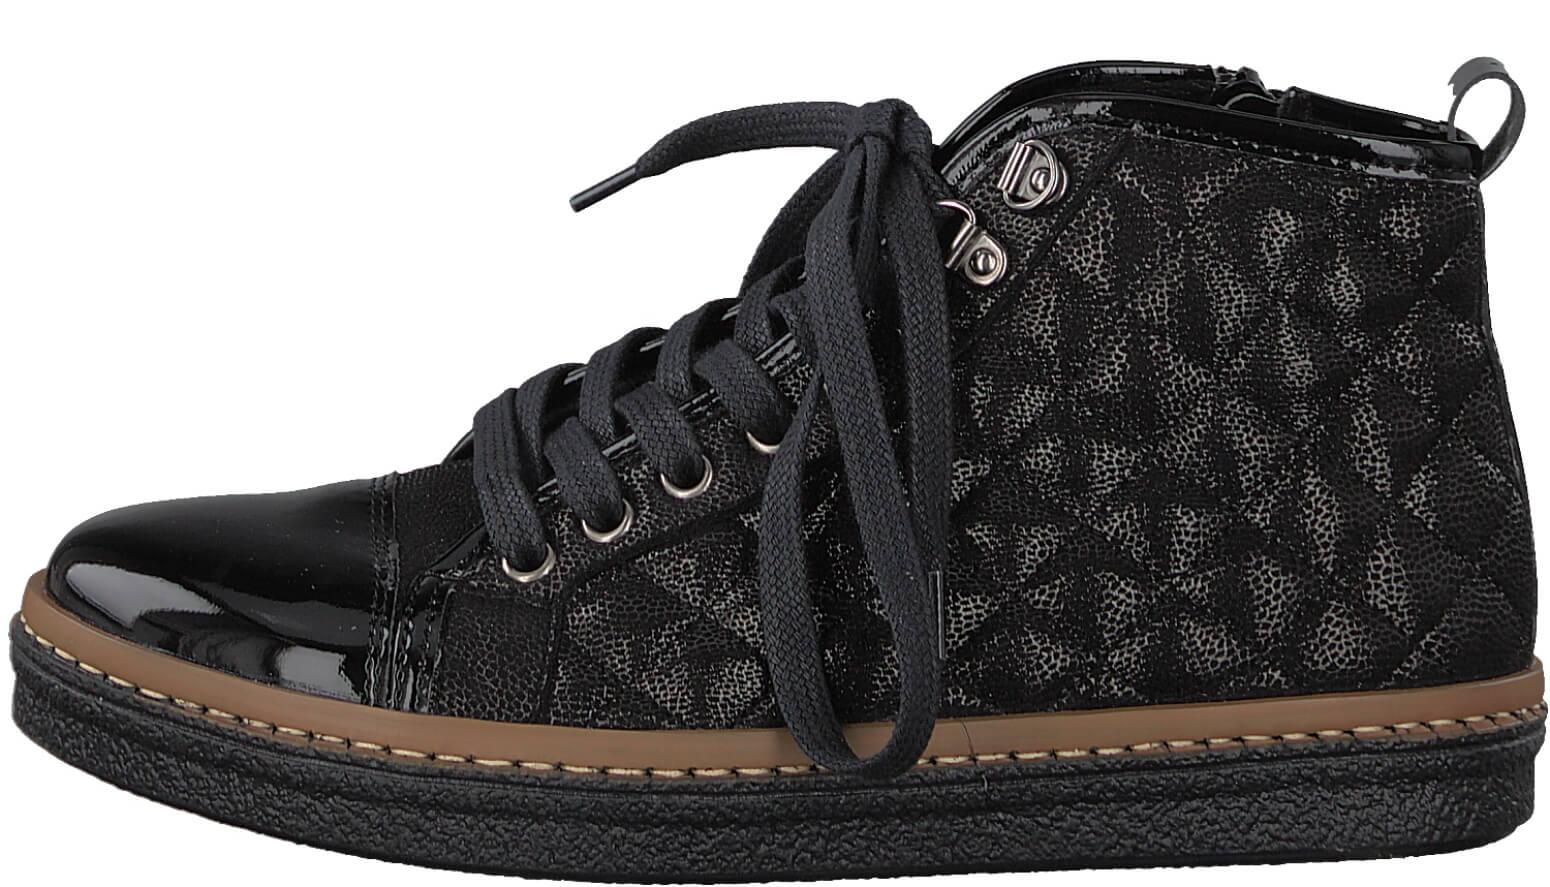 Tamaris Elegantní dámské kotníkové boty 1-1-25725-39-098 Black Comb ... fac47b1848